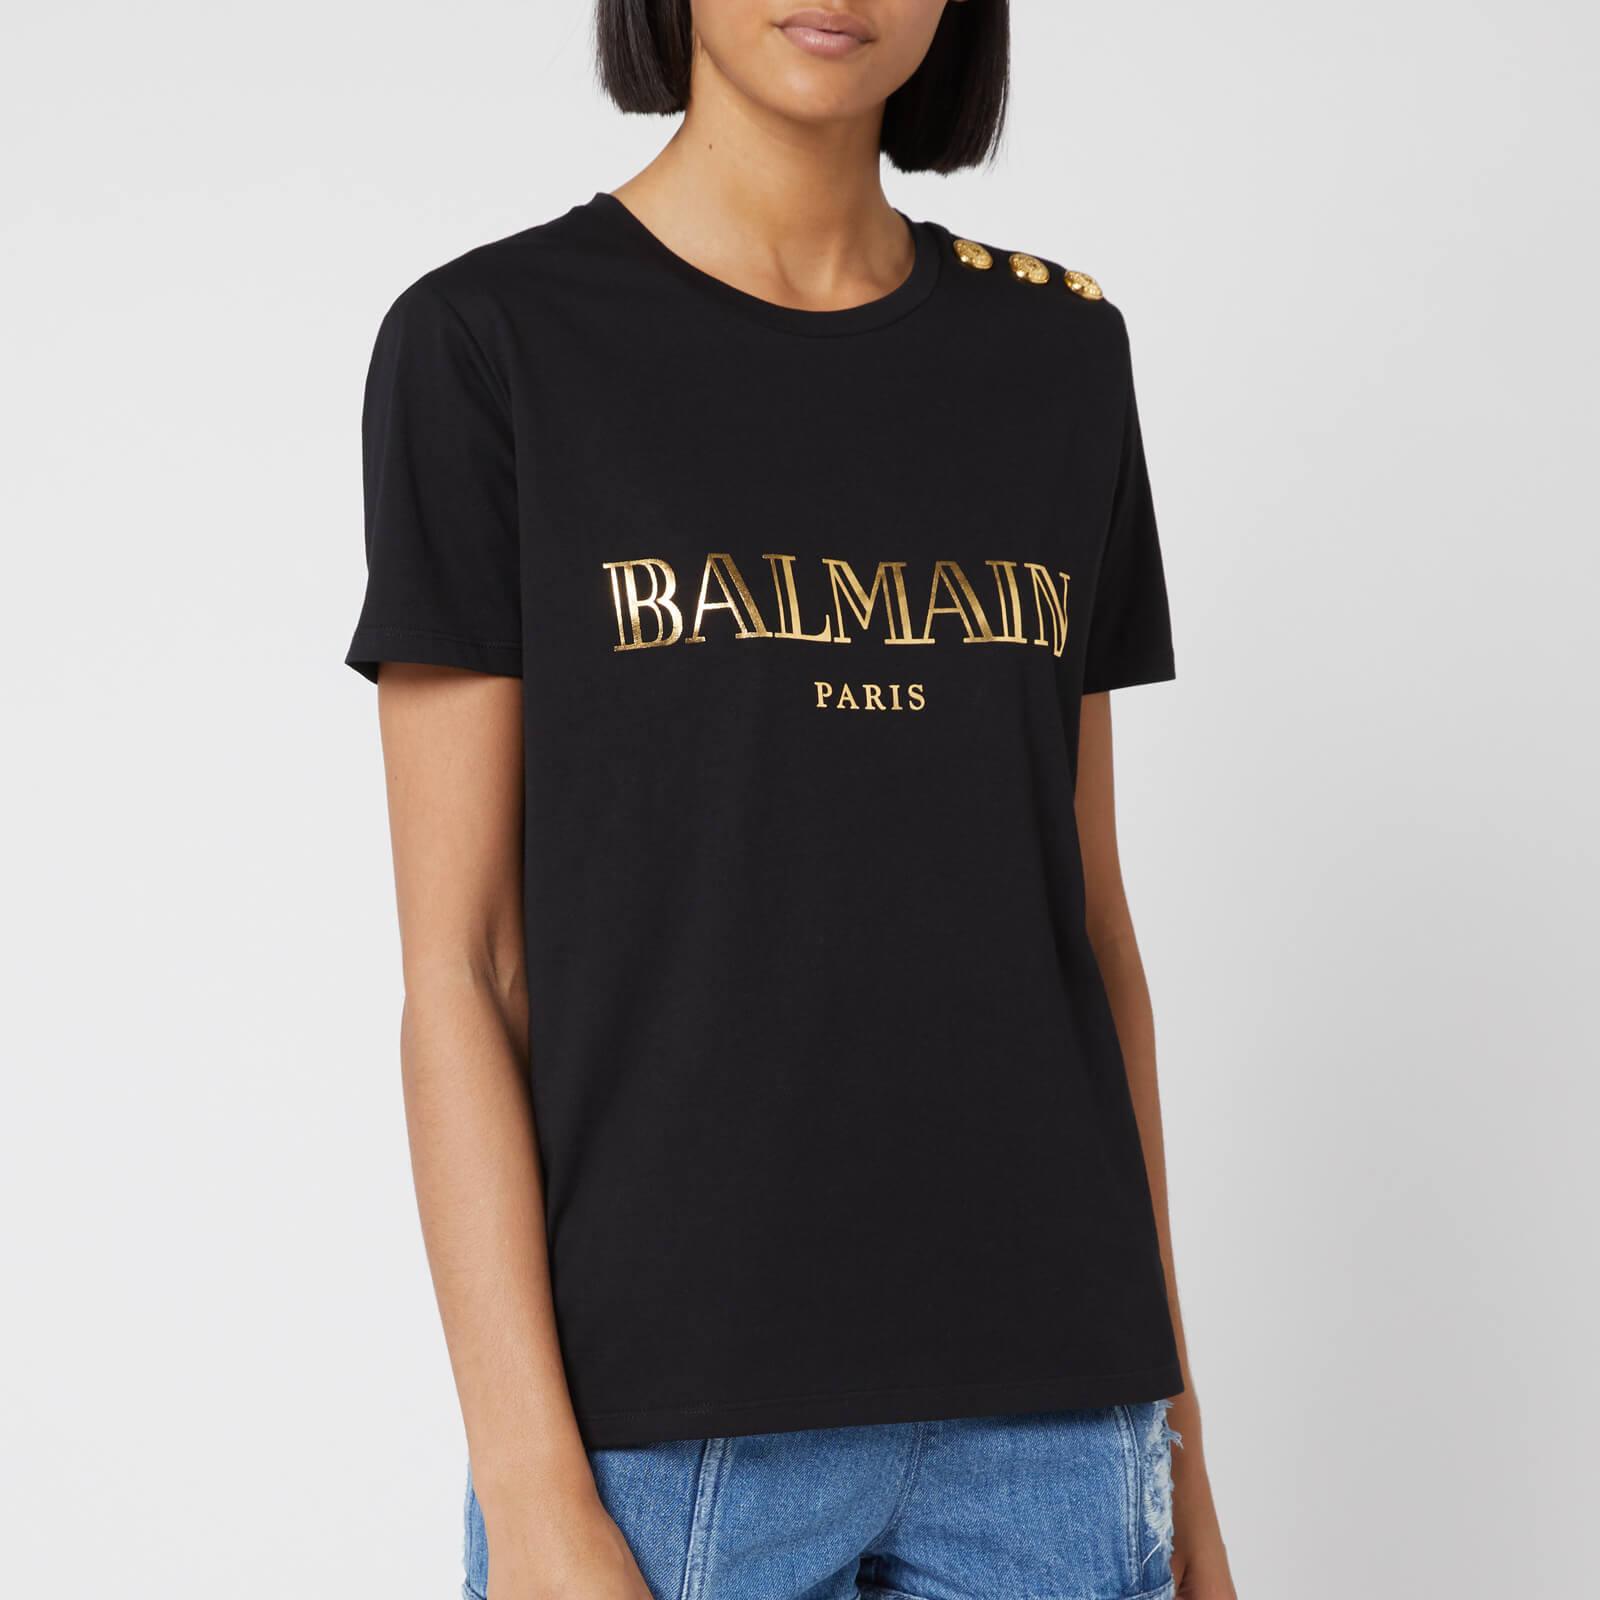 9a11f5724c9 Balmain Women's Logo T-Shirt - Black/Gold - Free UK Delivery over £50